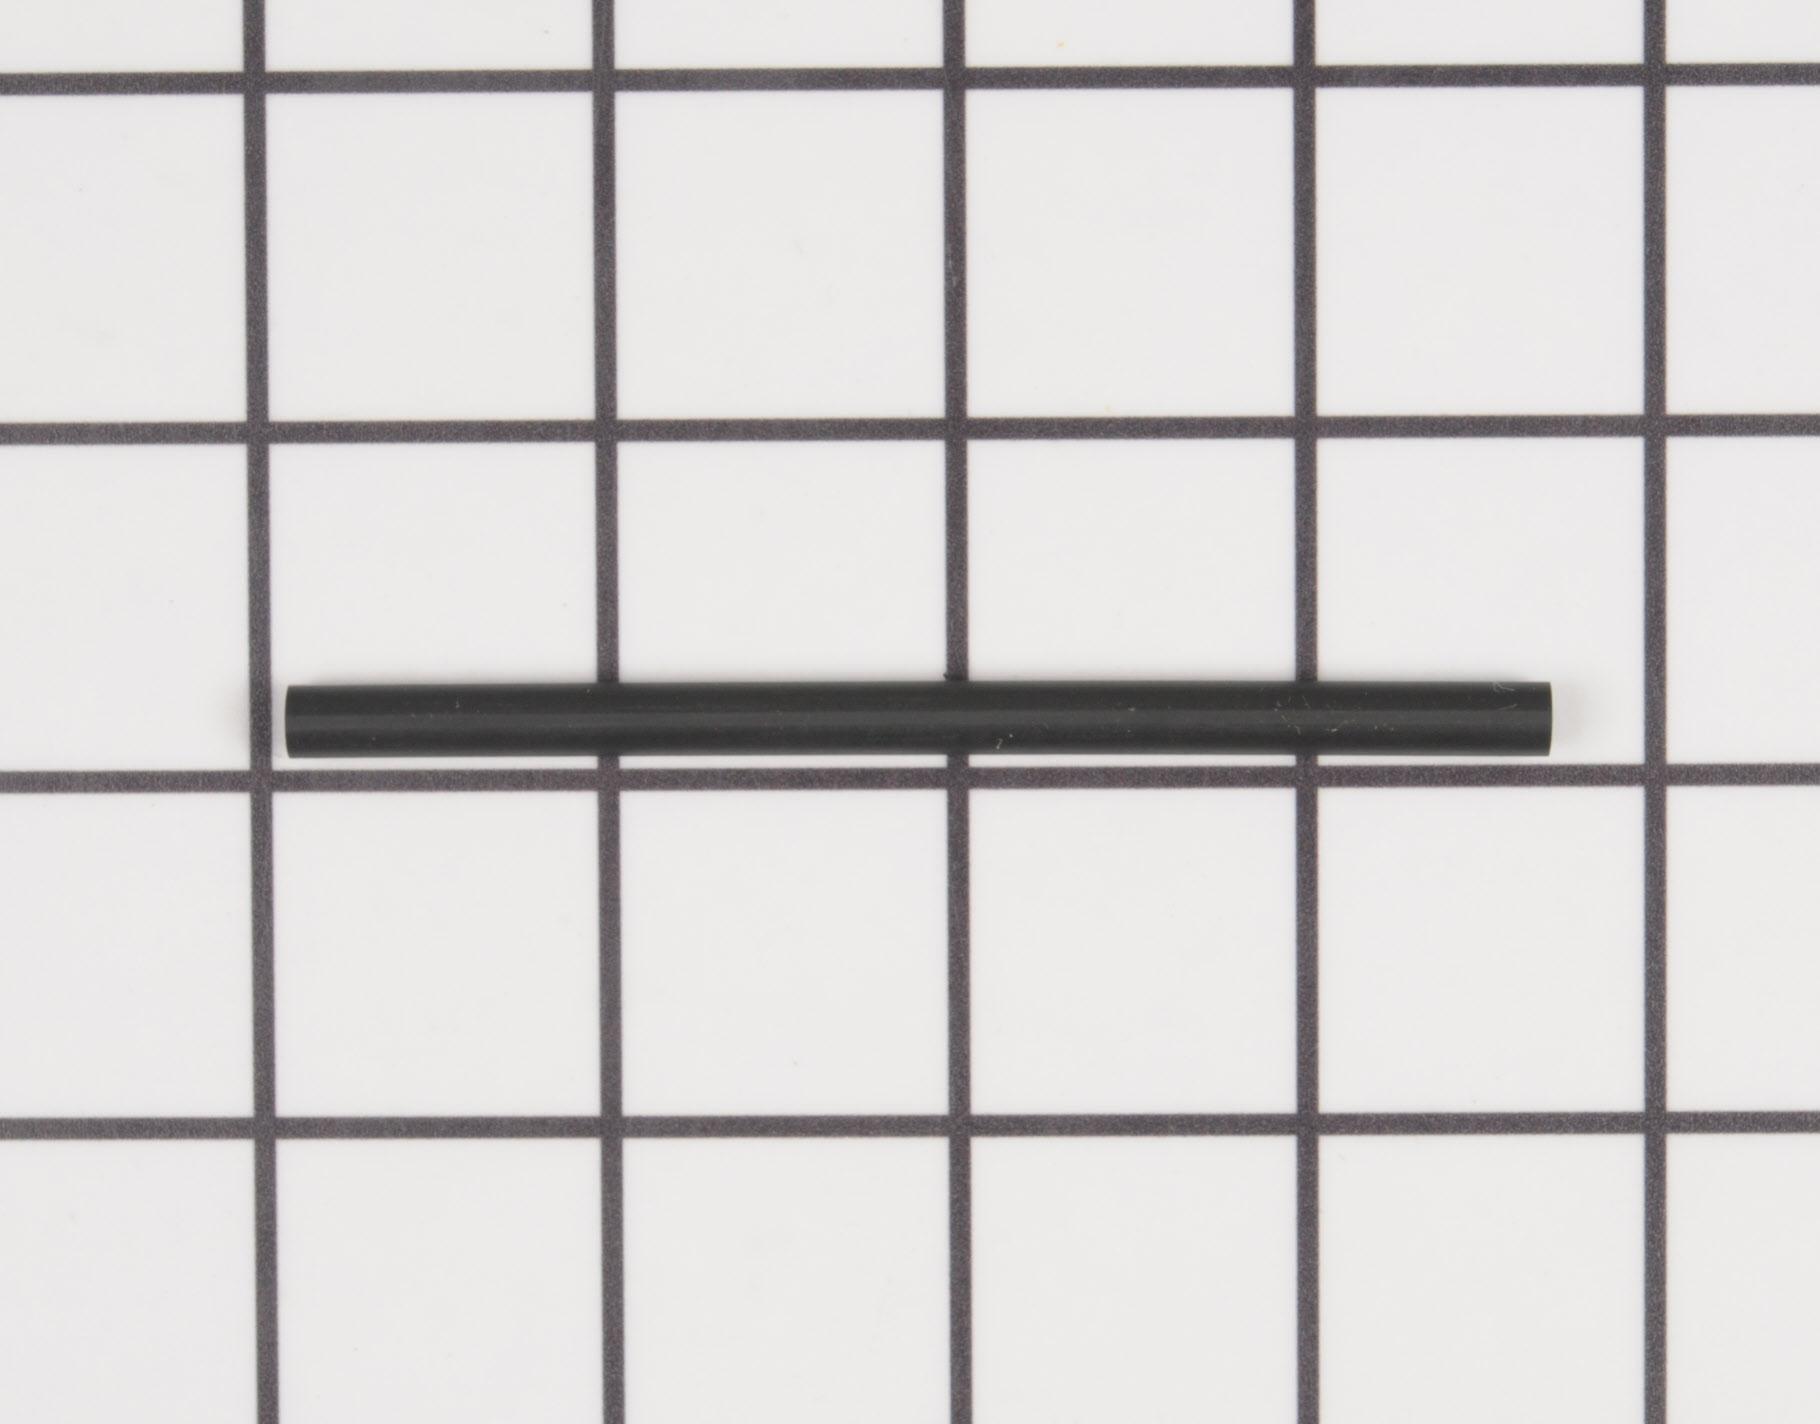 17701-Z0H-821 Honda Tiller Part -Fuel Line